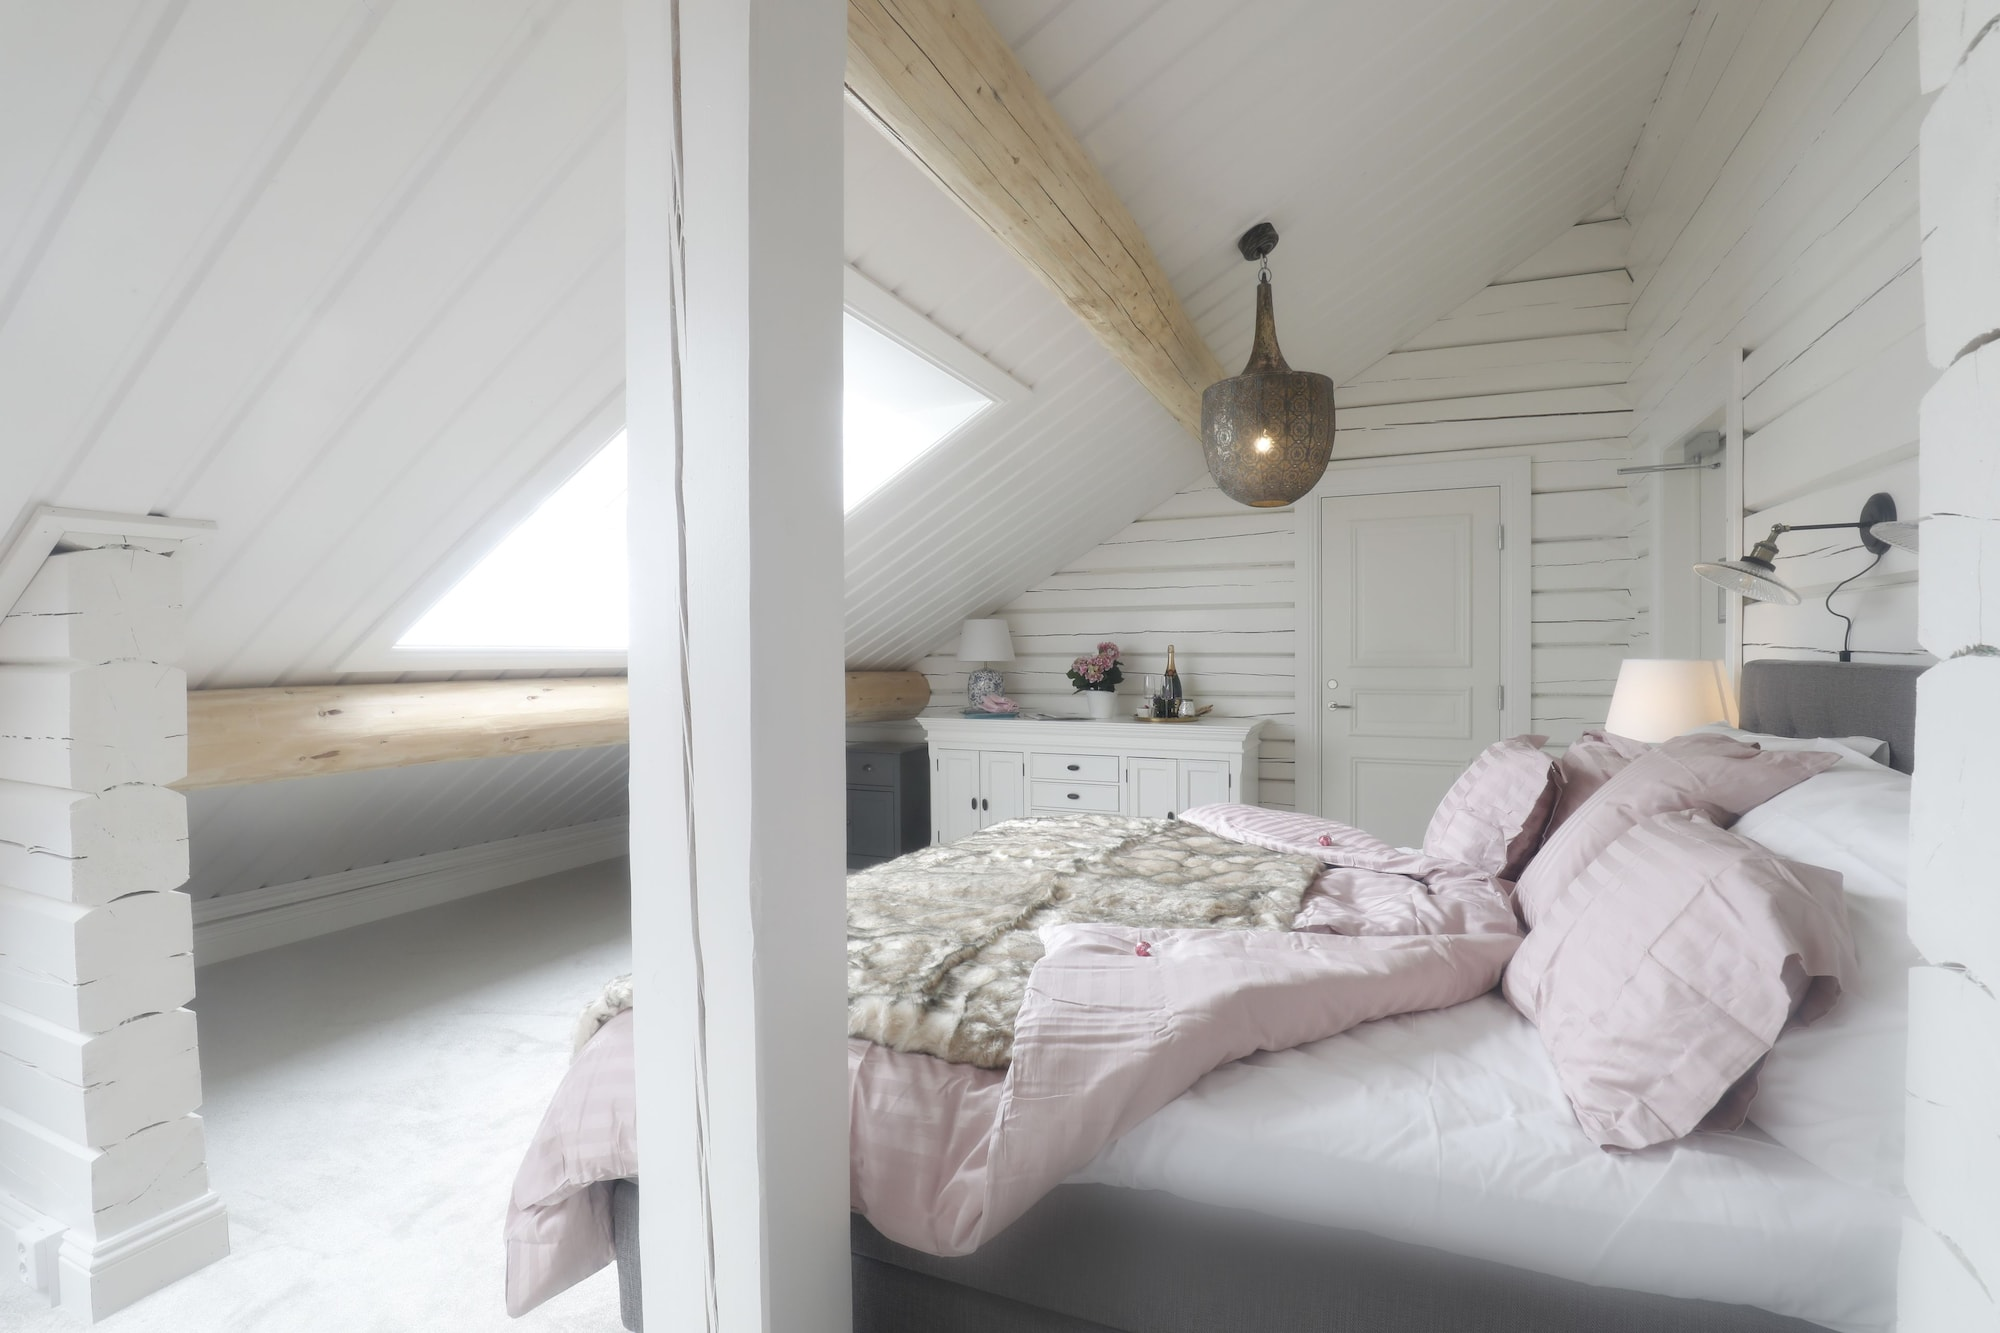 Sara's Bed and Breakfast, Ånge